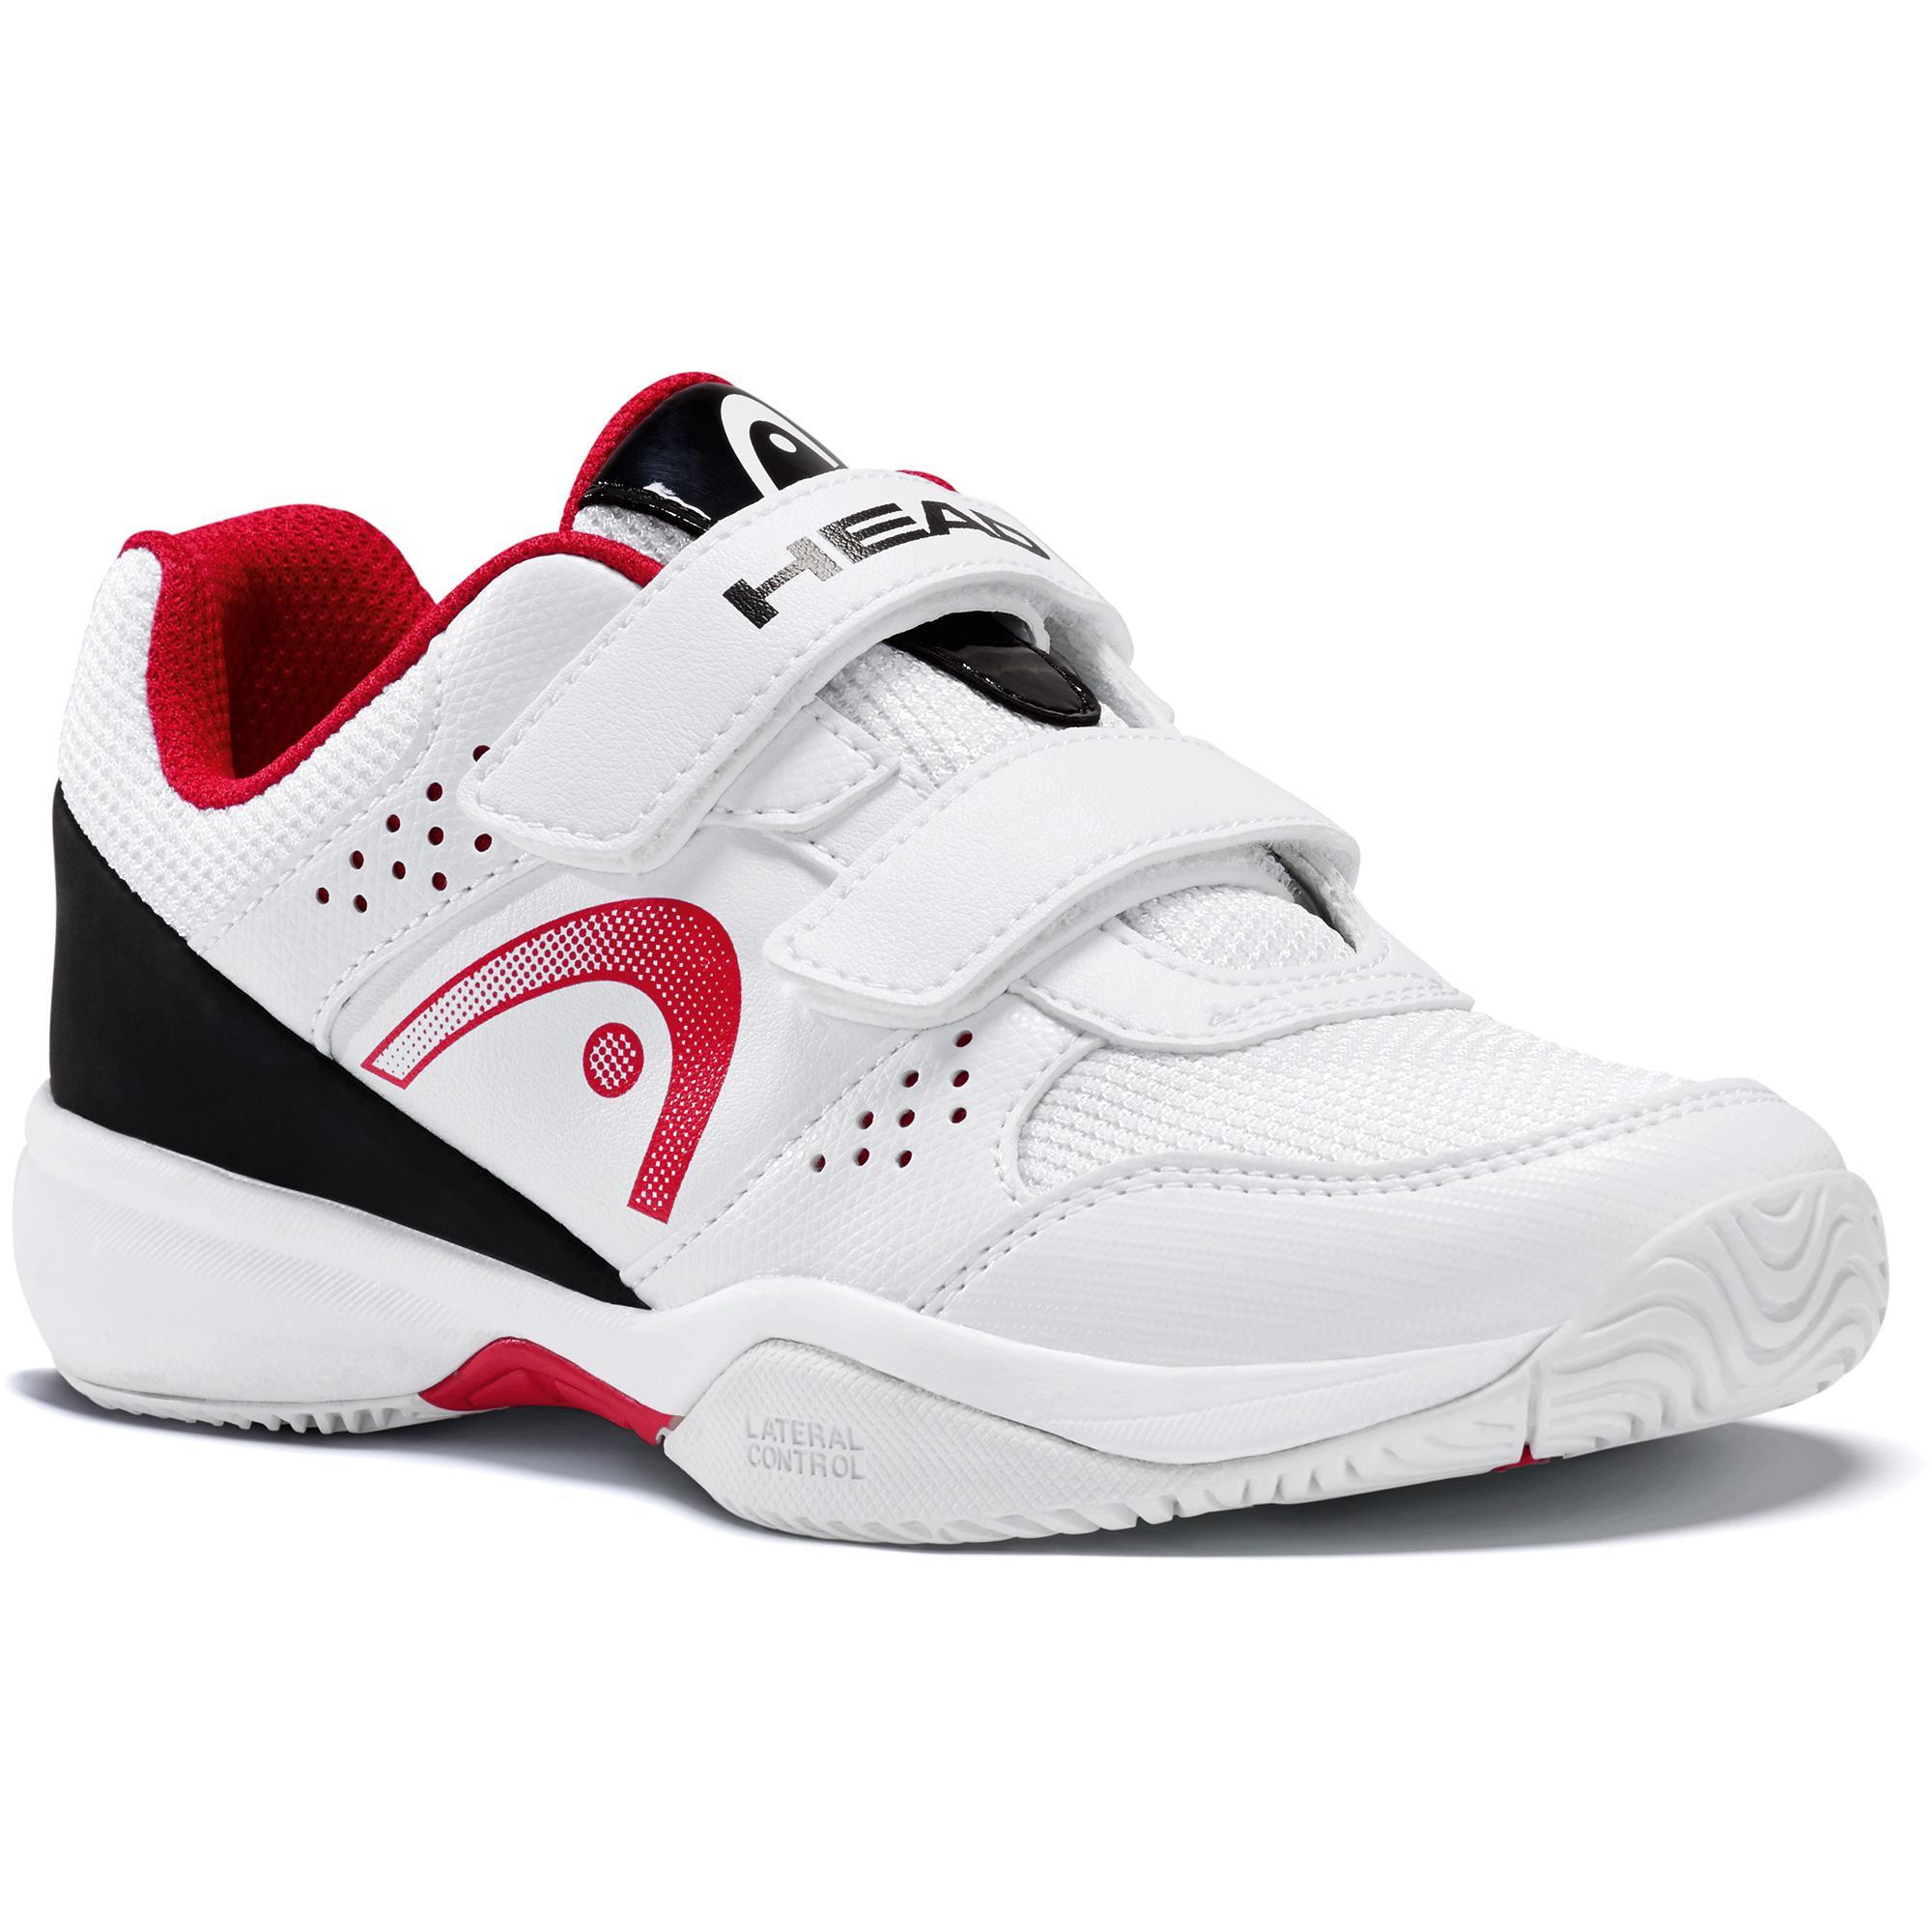 26322f5a5 Кроссовки для тенниса детские Head, Детские теннисные кроссовки Head, Купить,  Цена